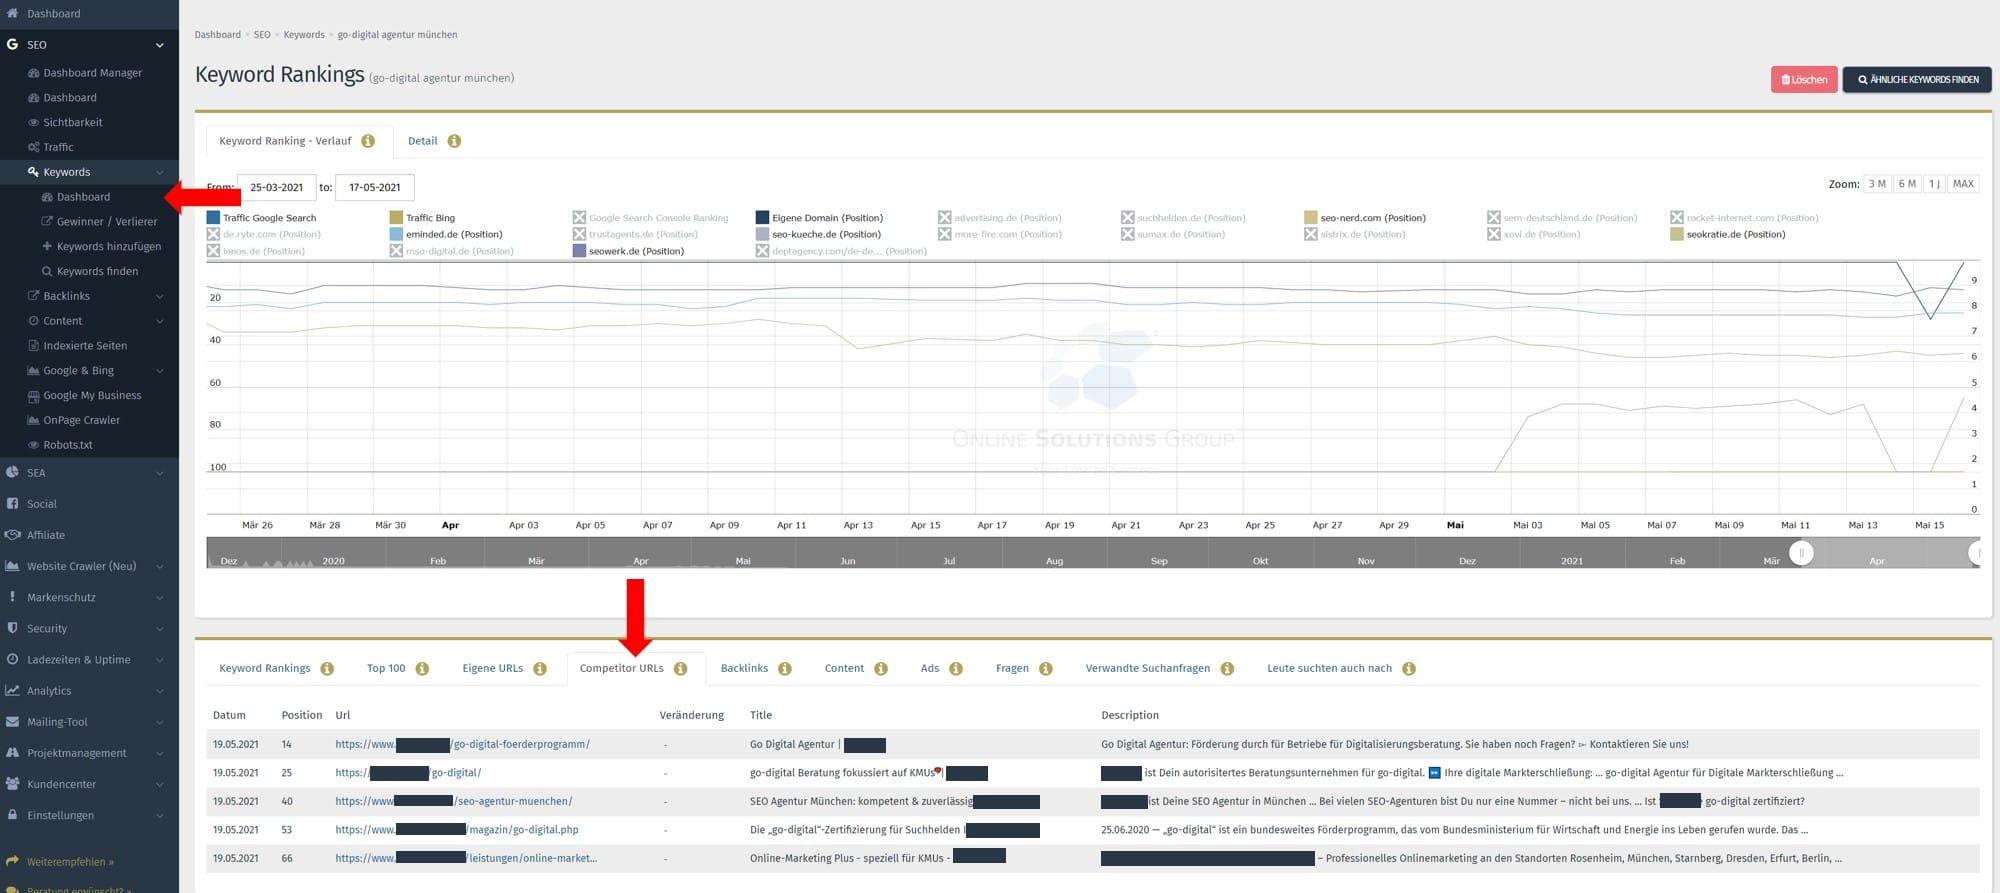 Content Tool Performance Suite Competitor URLs